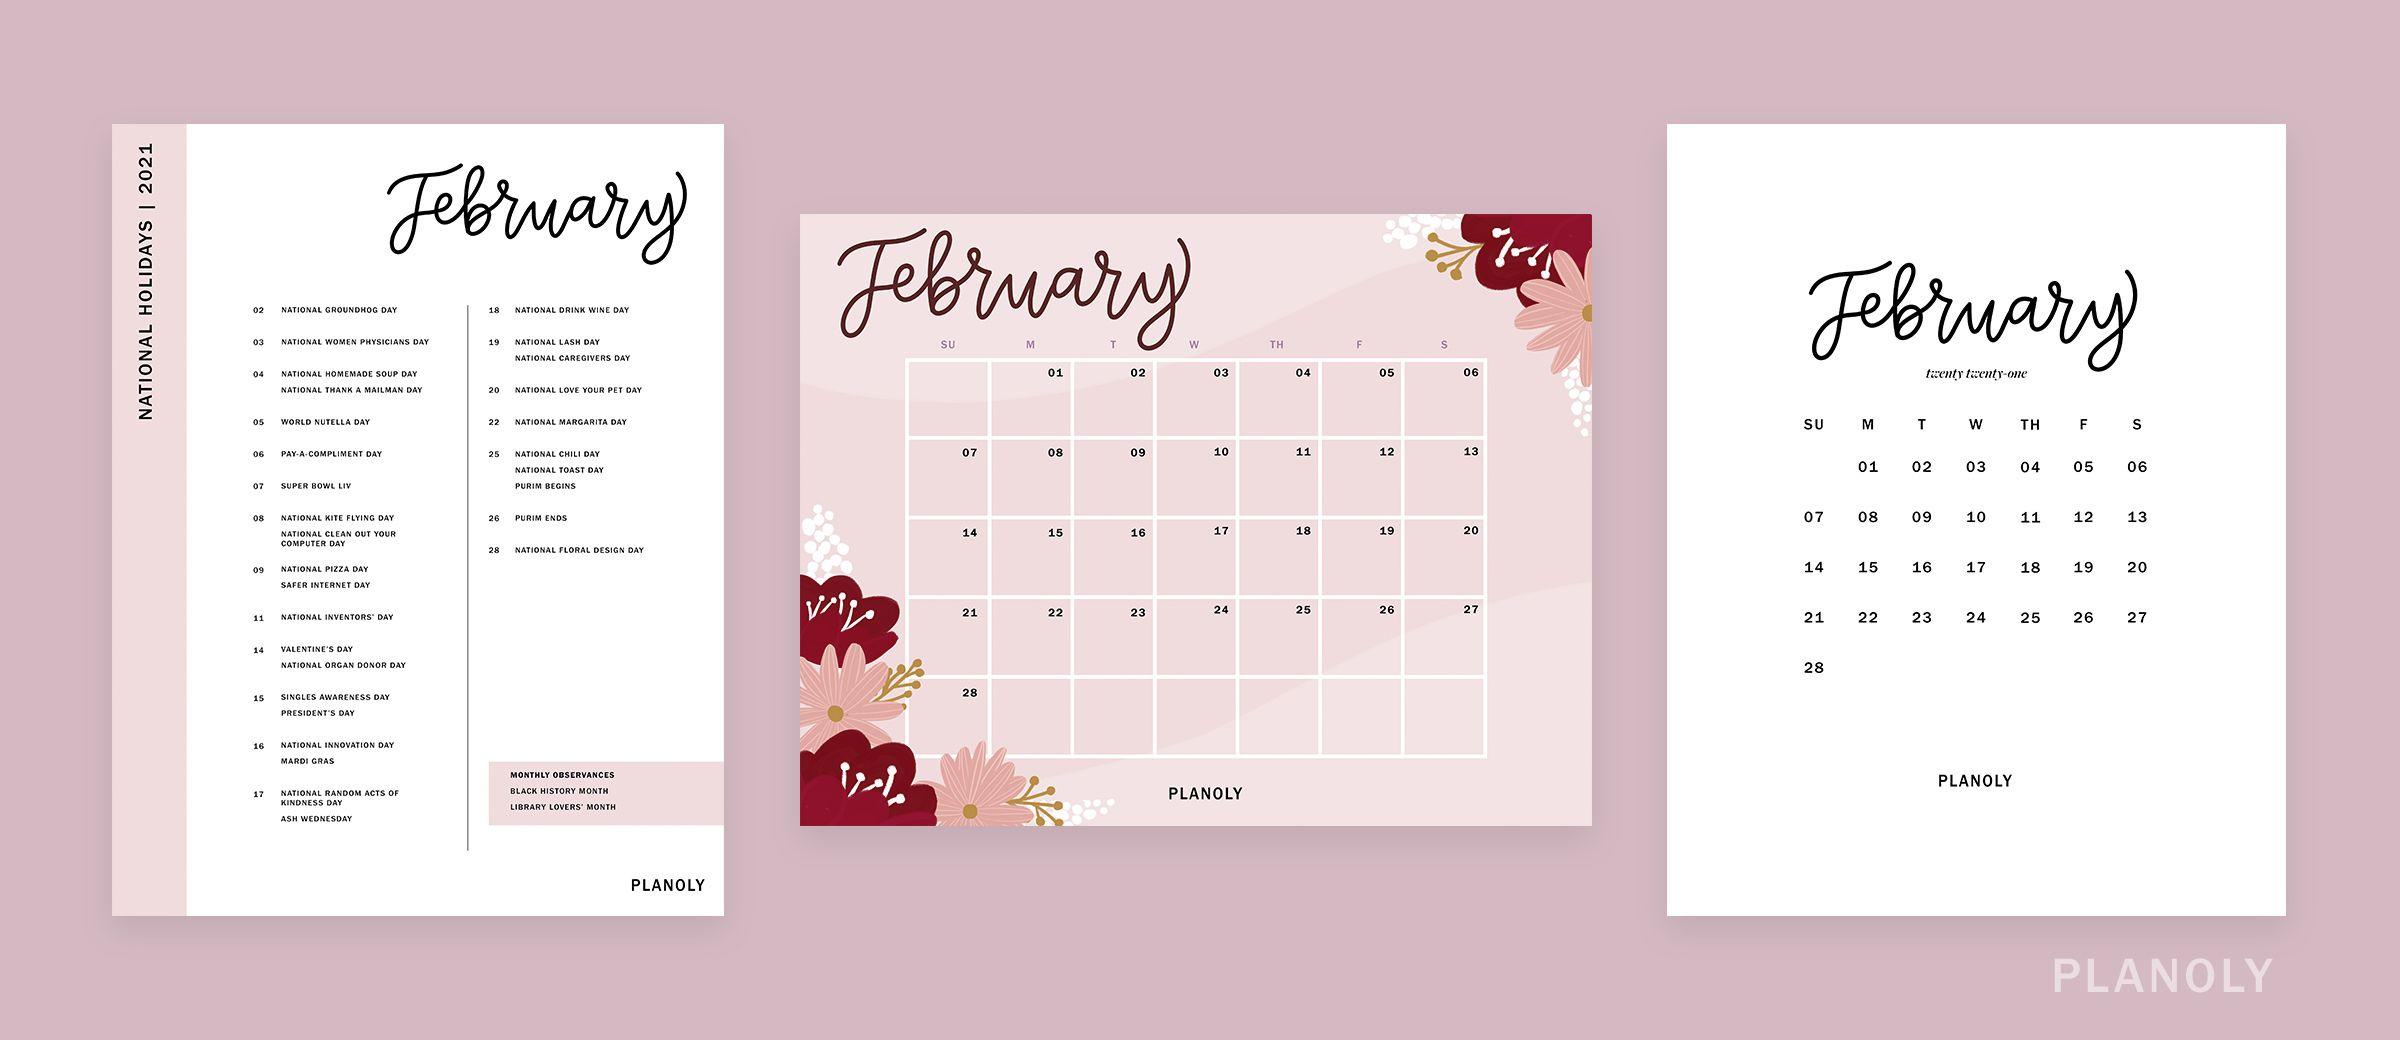 PLANOLY-Blog Post-Q1 Content Calendars-Image 2